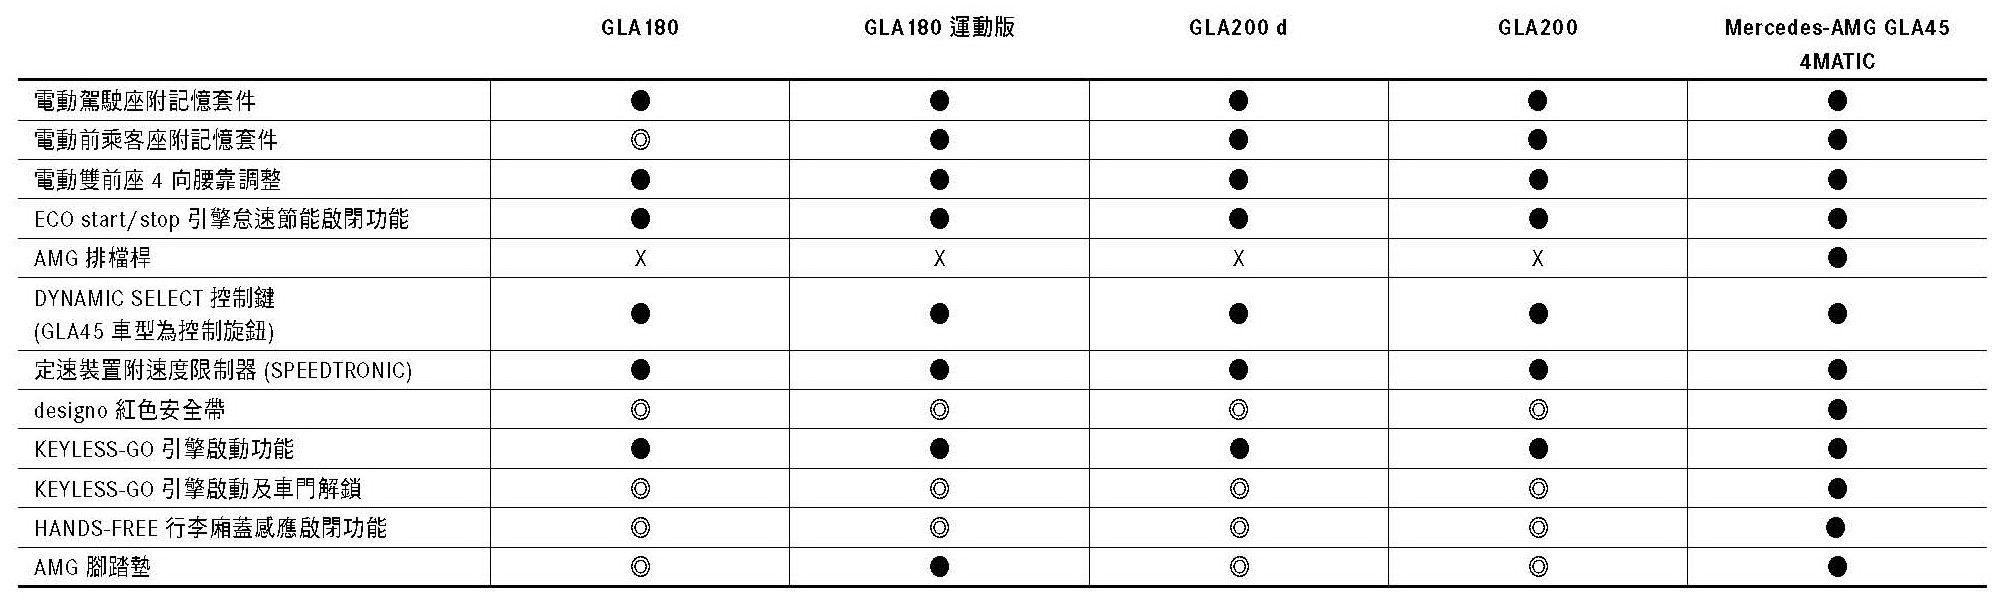 MY1718 GLA規格配備表20170510_final_頁面_09